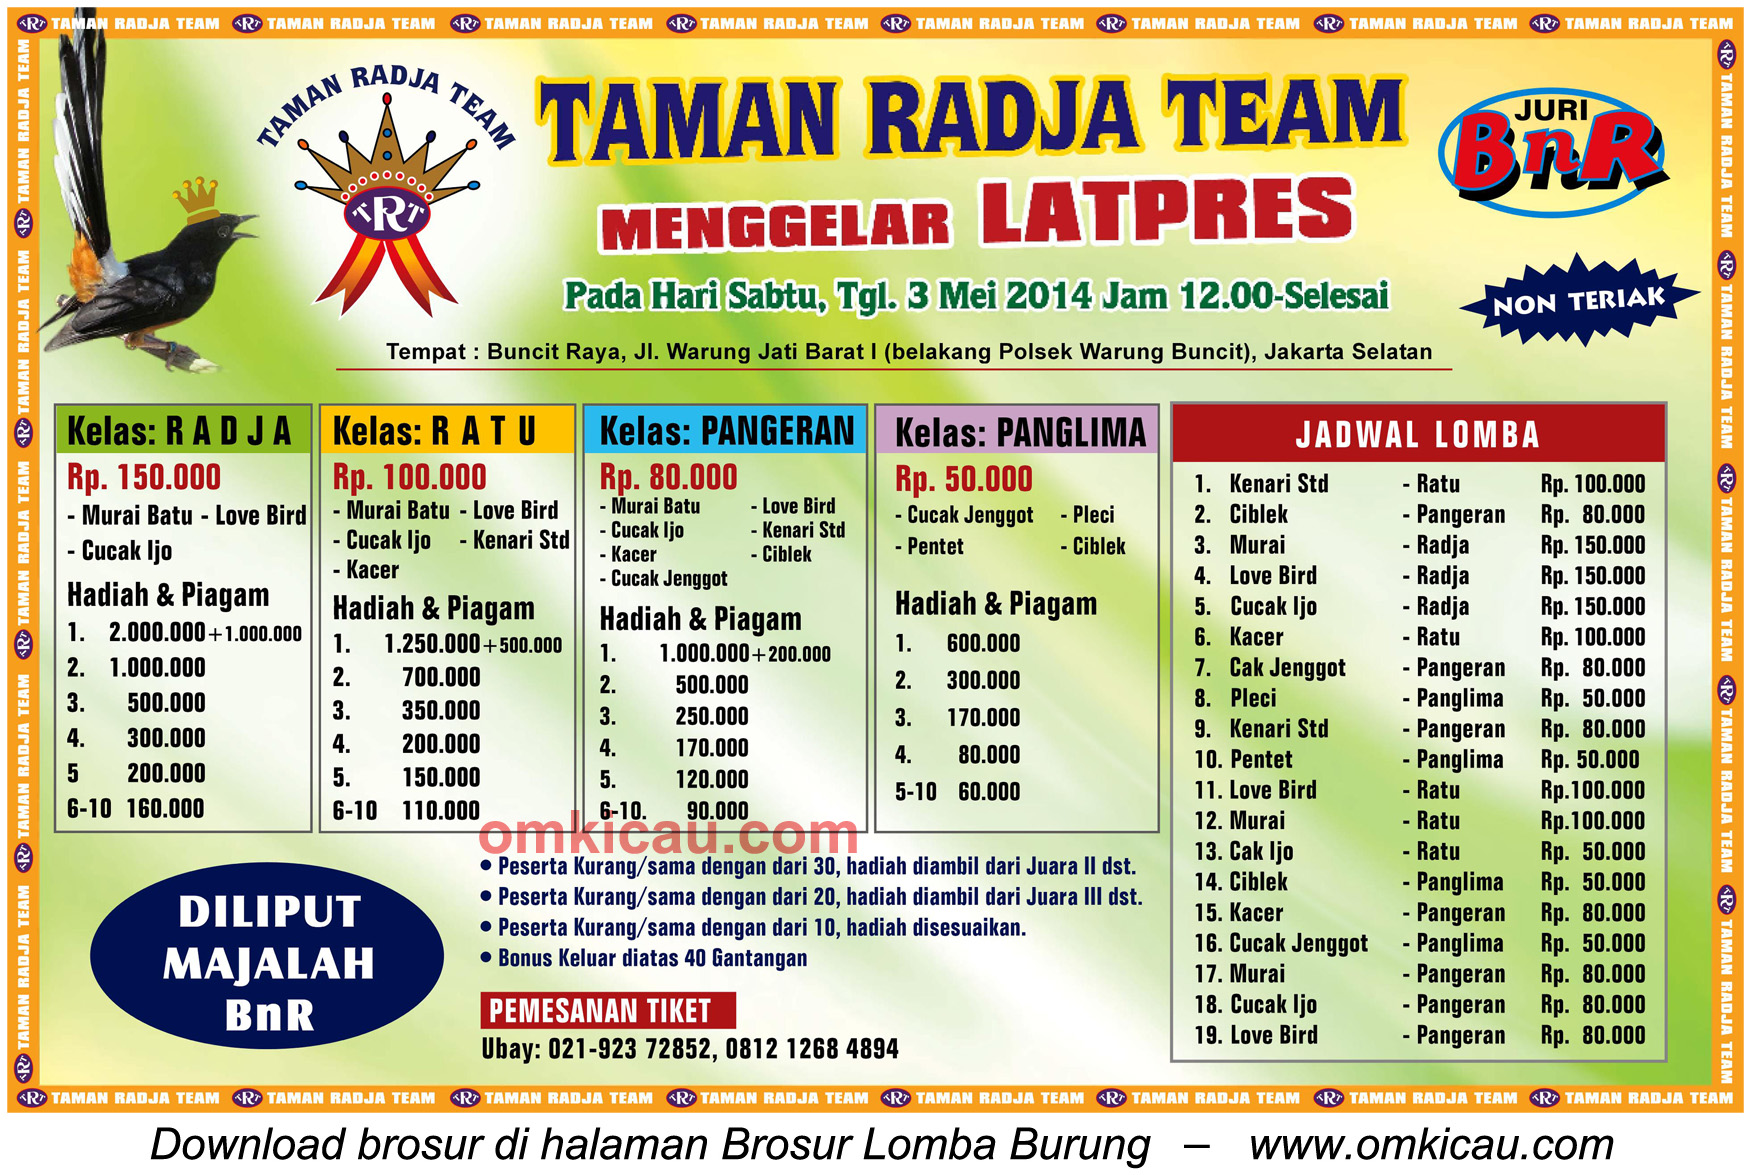 Brosur Latpres Taman Radja Team, Jakarta Selatan, 3 Mei 2014